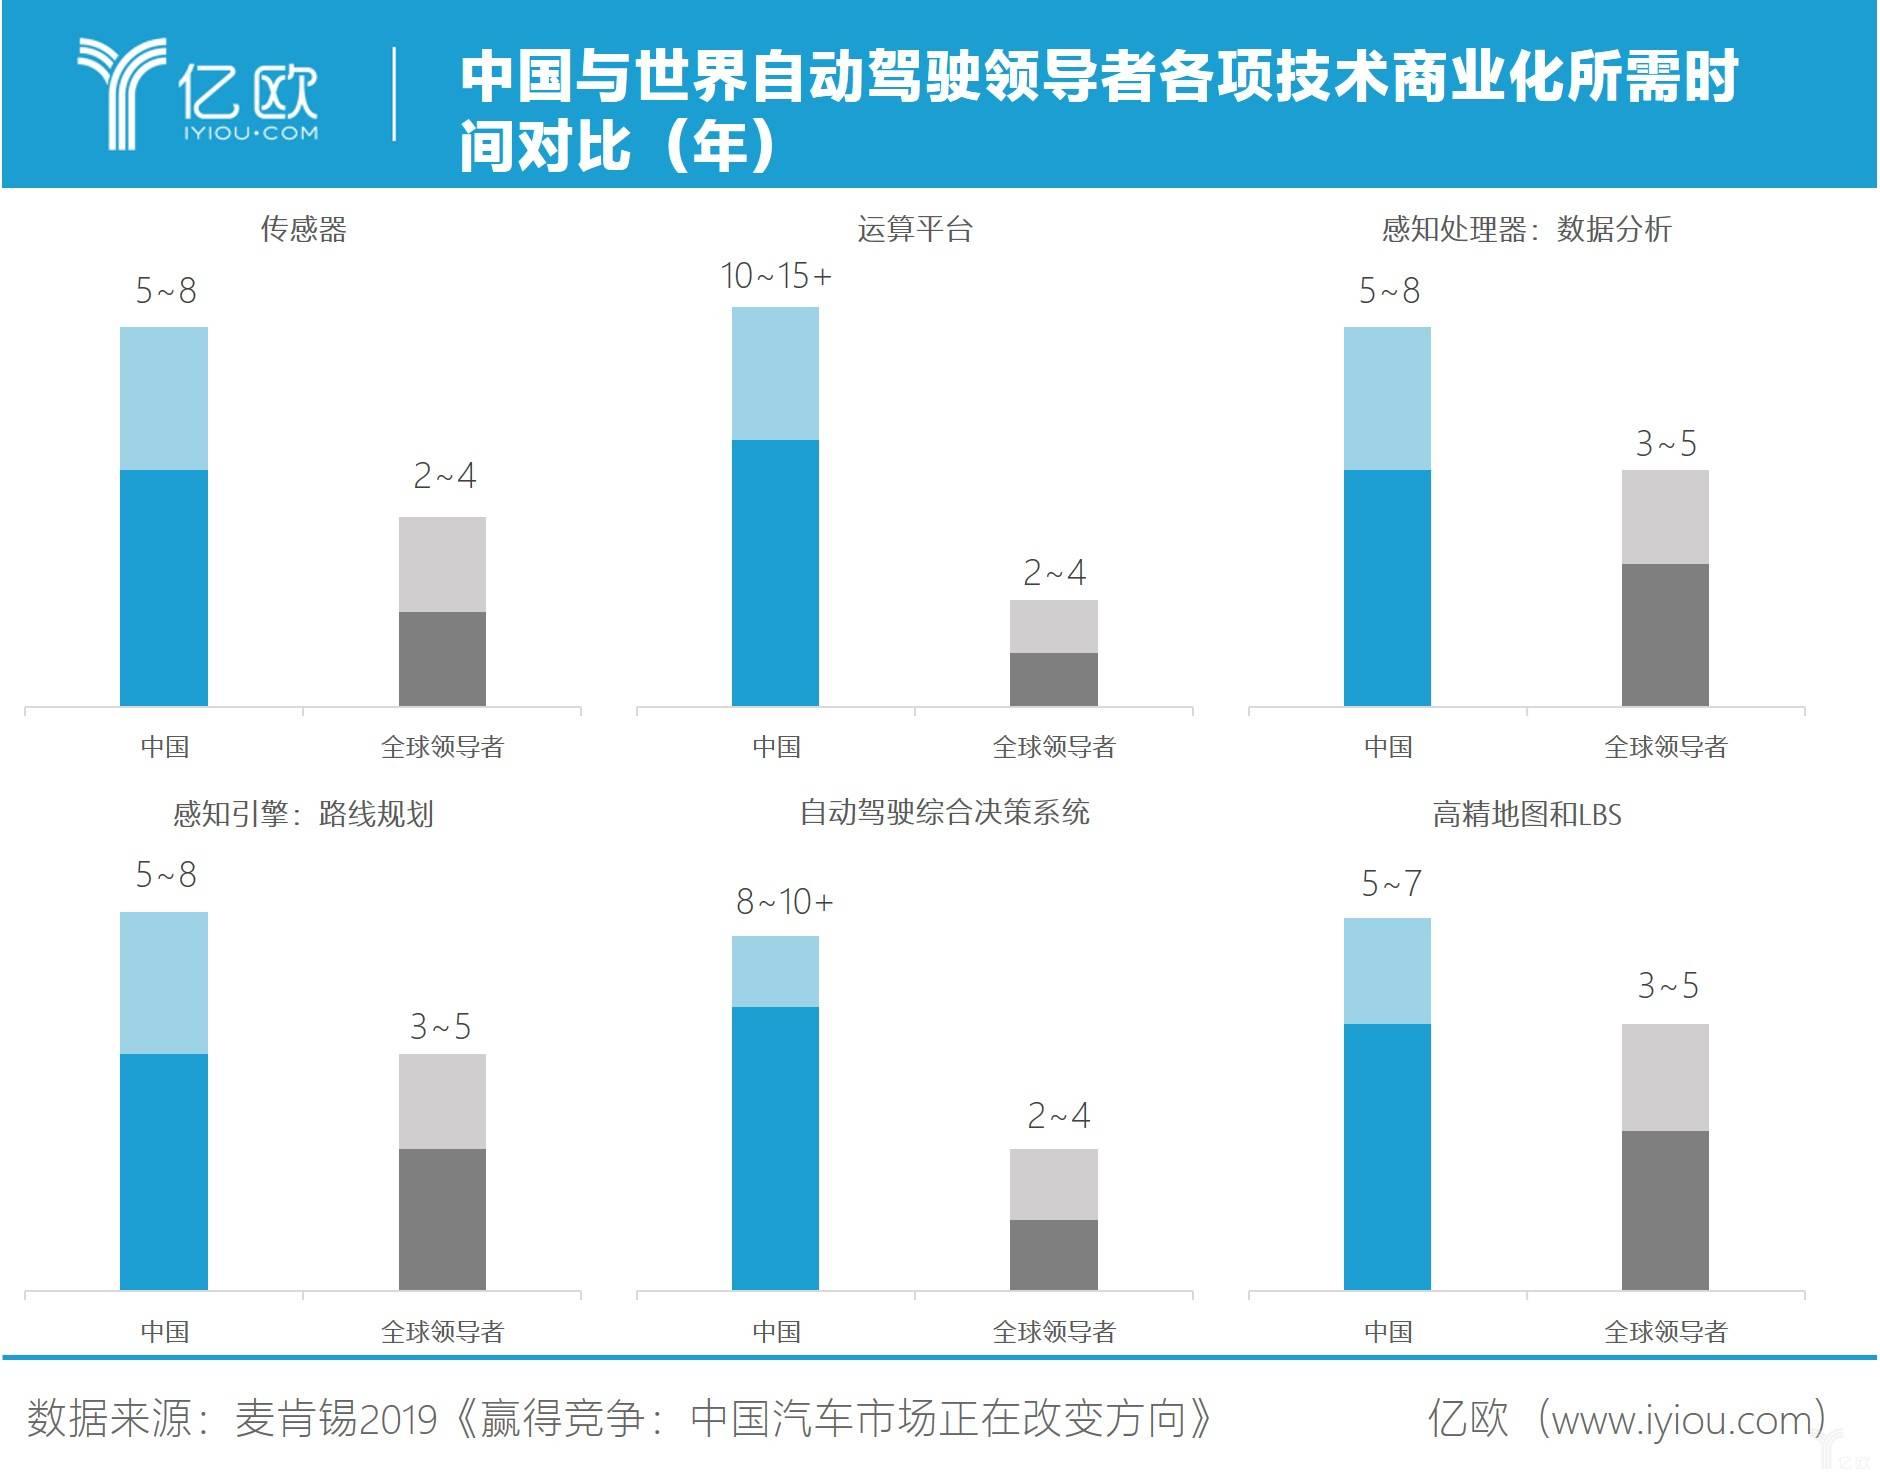 McKinsey预测中国与世界自动驾驶领导者各项技术商业化所需时间对比